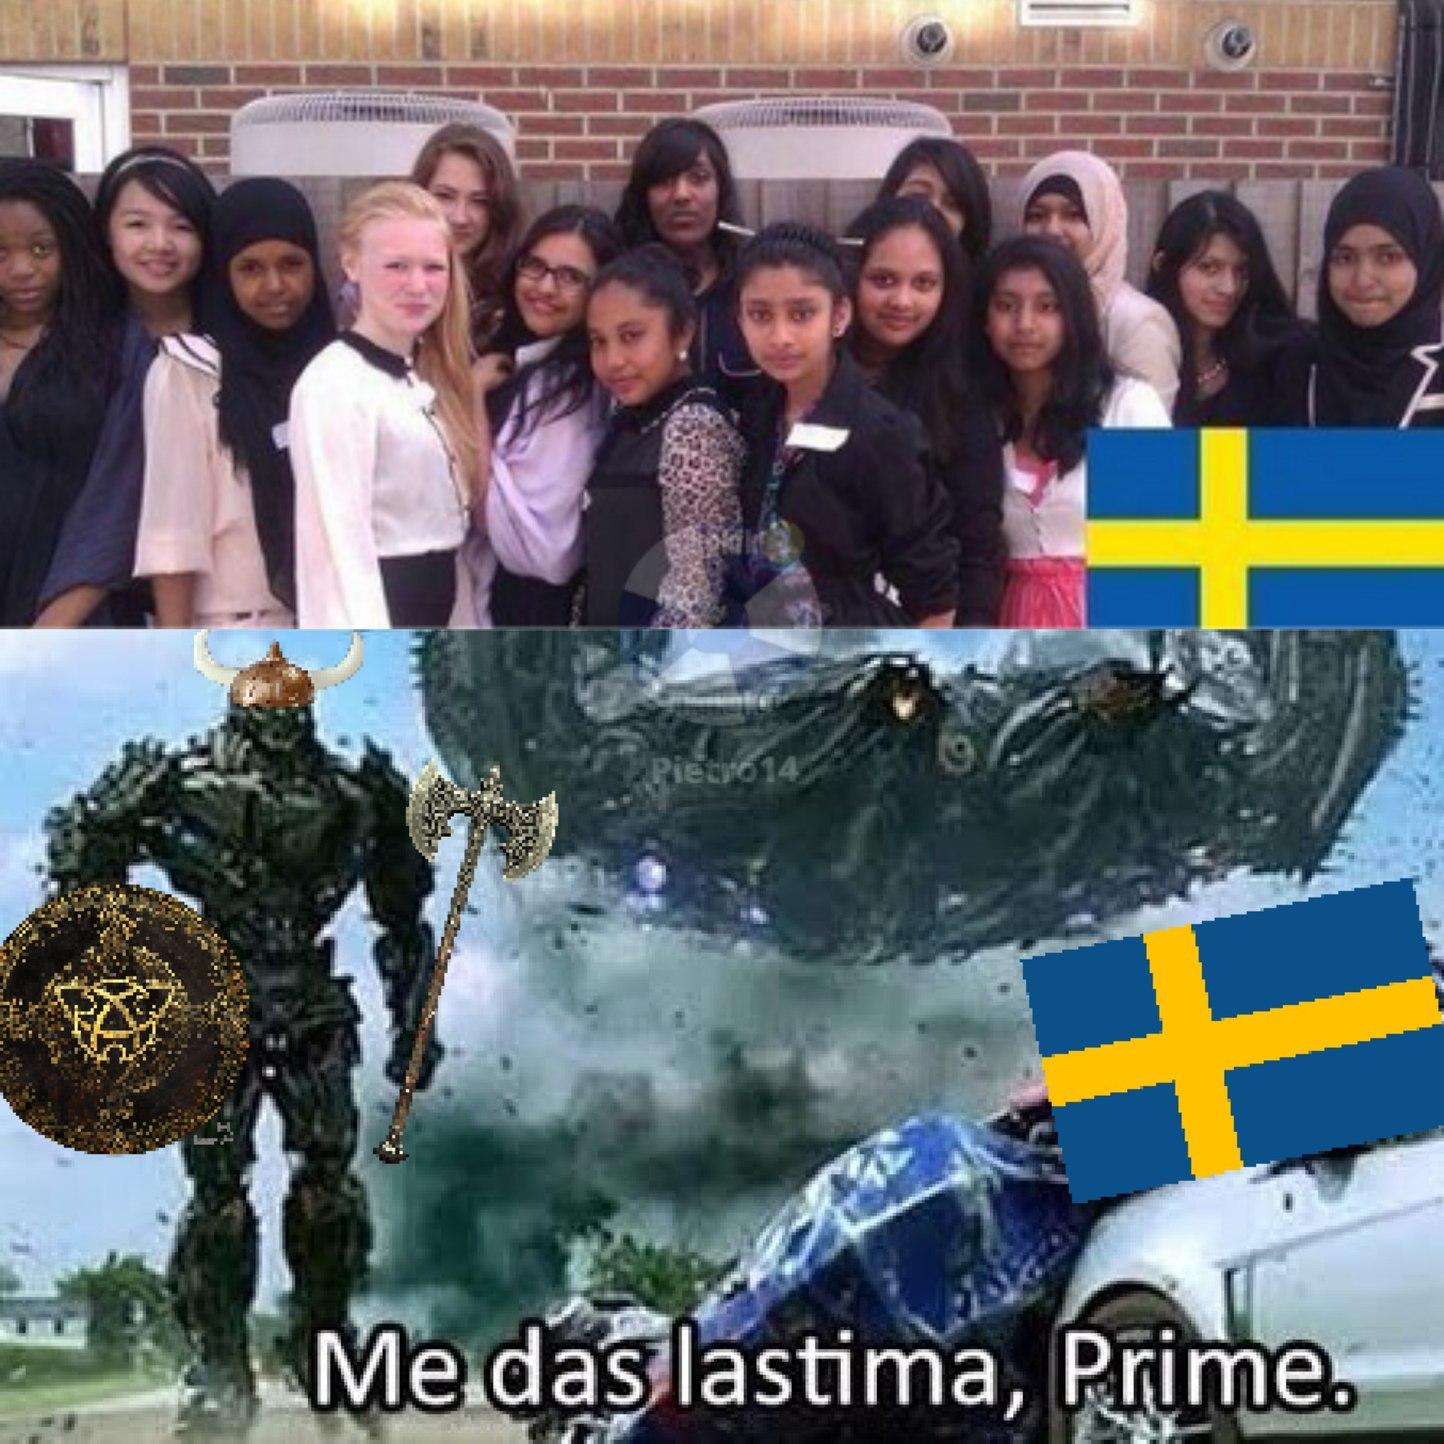 me das lastima suecia - meme